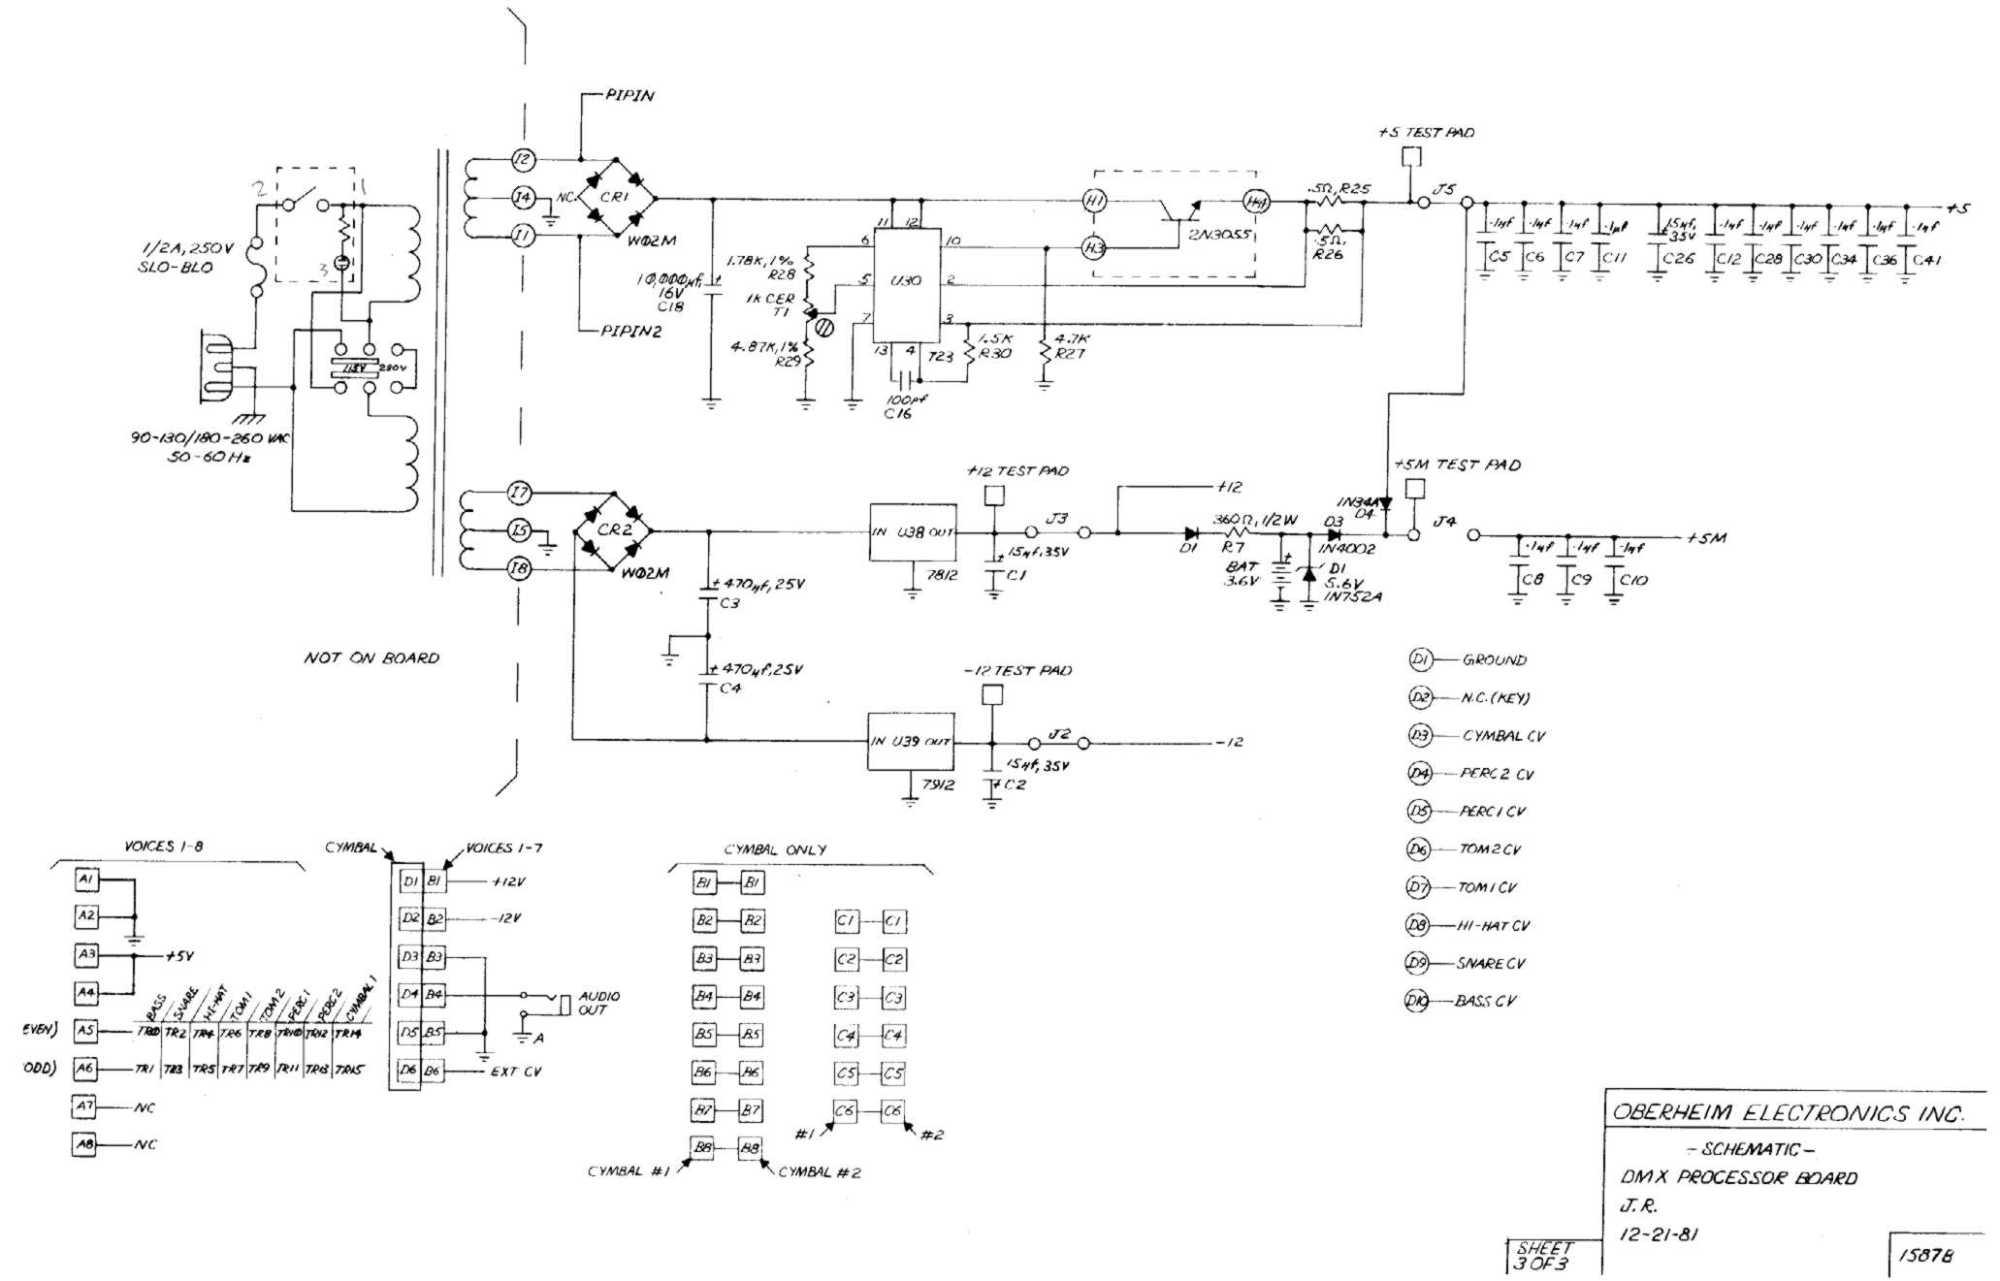 hight resolution of dmx control wiring diagram free download schematic wiring diagramdmx control wiring diagram free download schematic miscellaneous